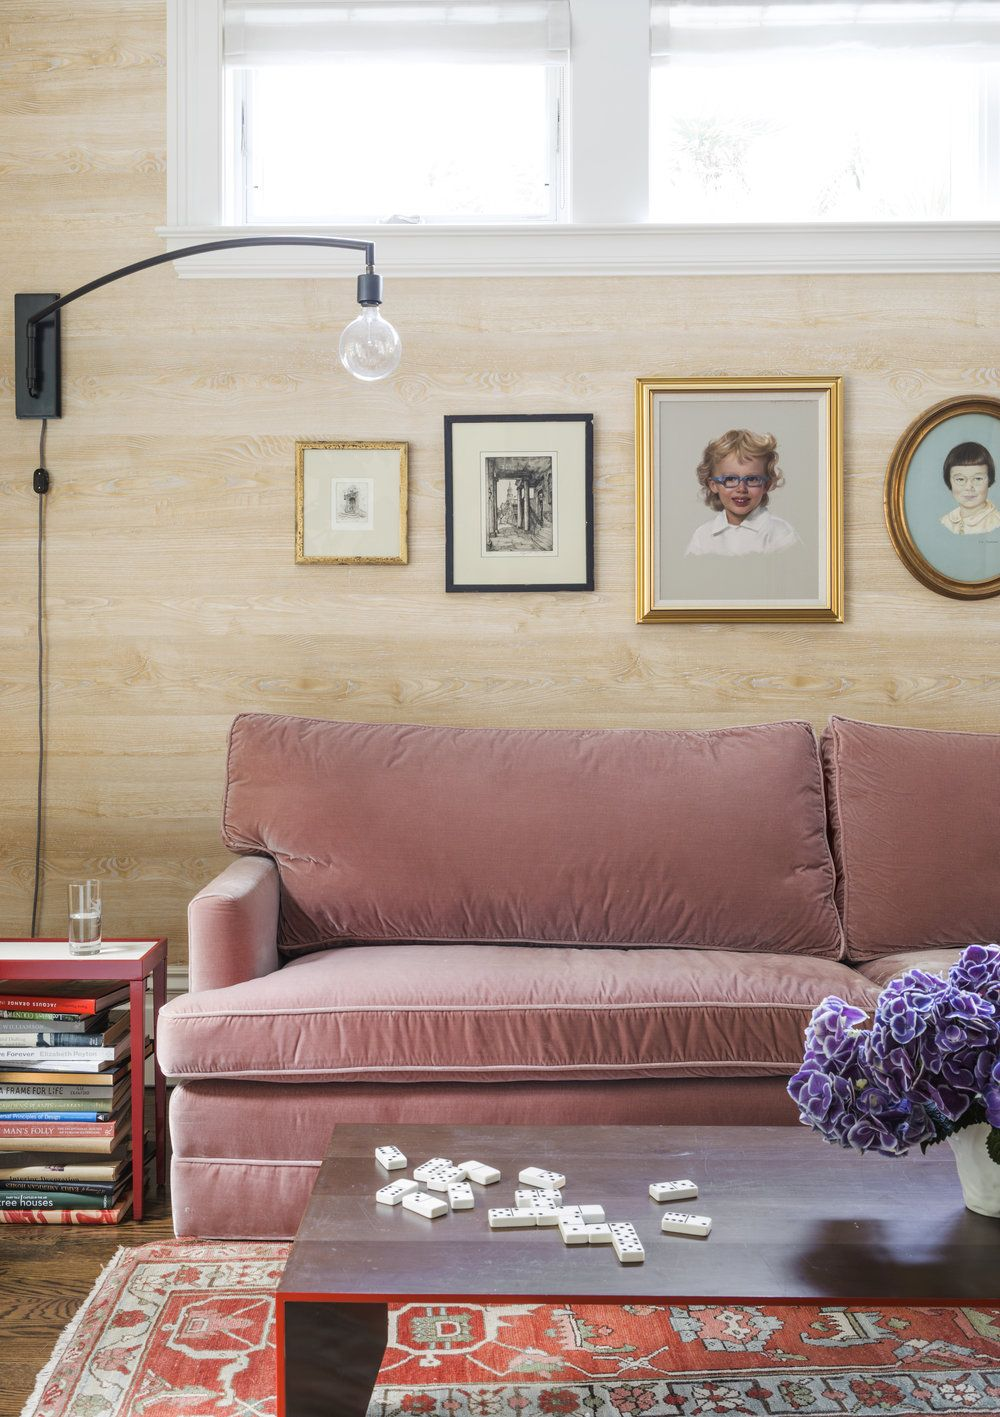 House Beautiful & 40+ Best Living Room Decorating Ideas \u0026 Designs - HouseBeautiful.com